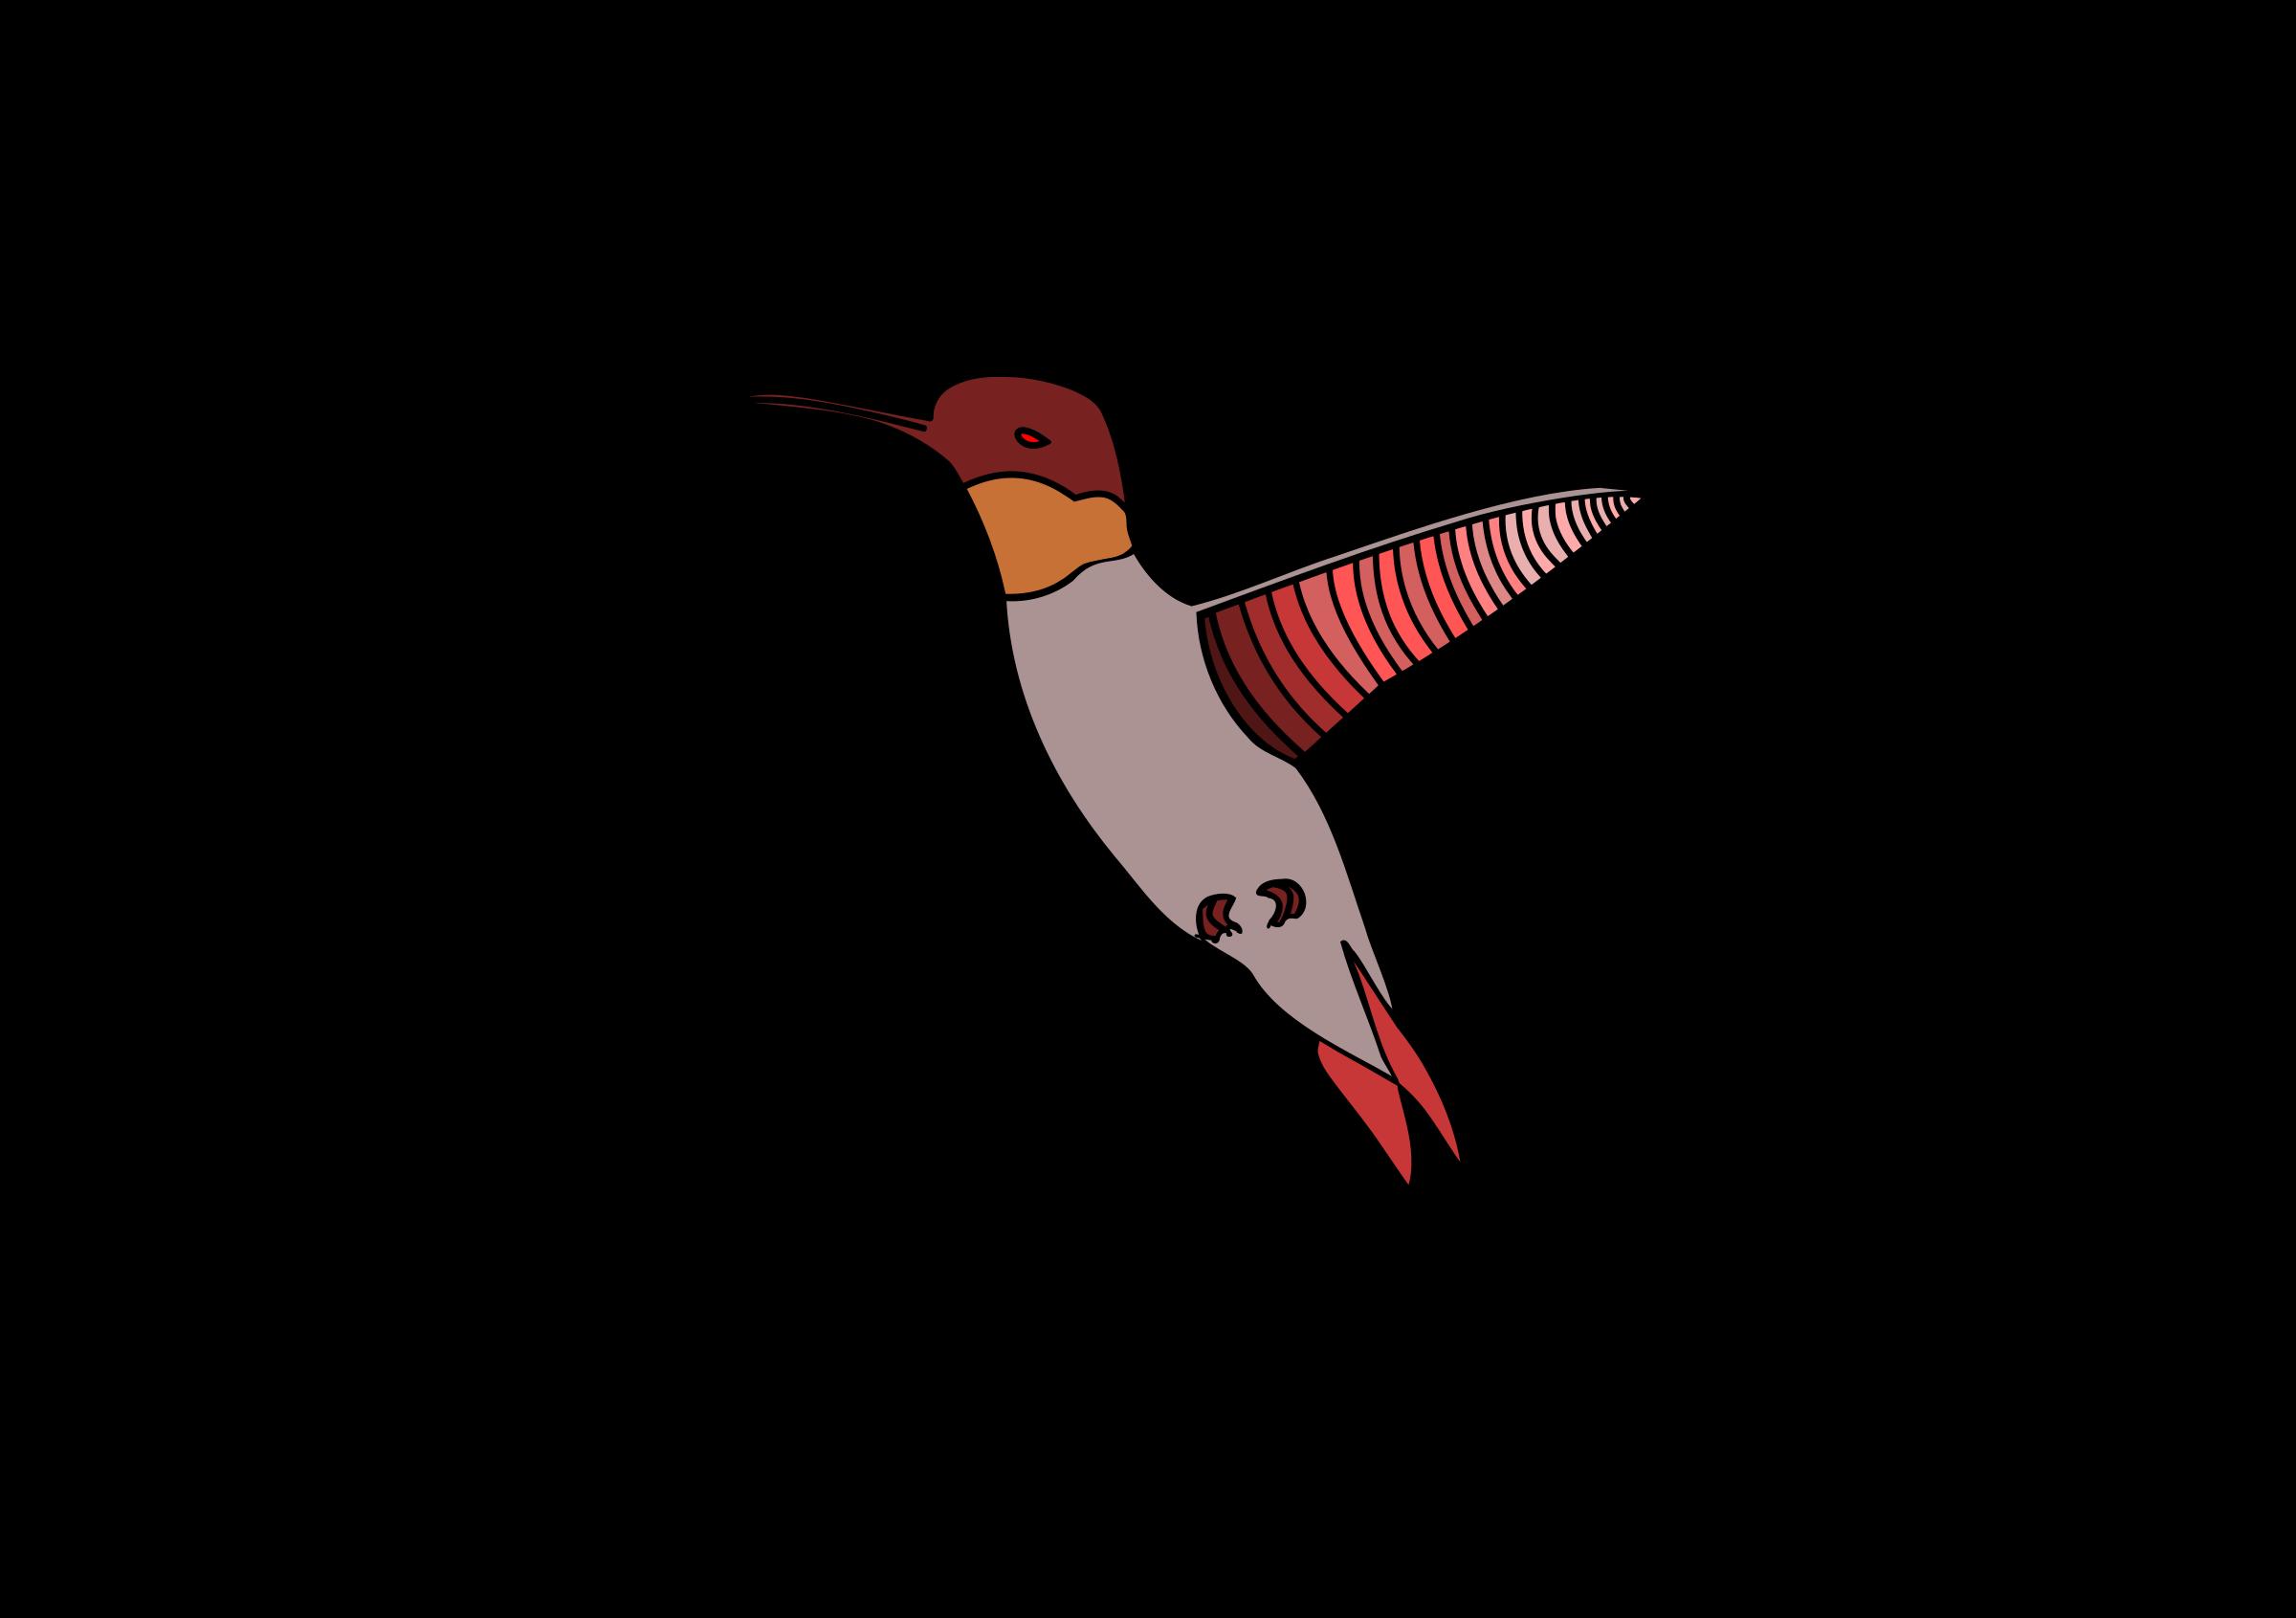 Hummingbird clipart svg free. Flying humming bird icons